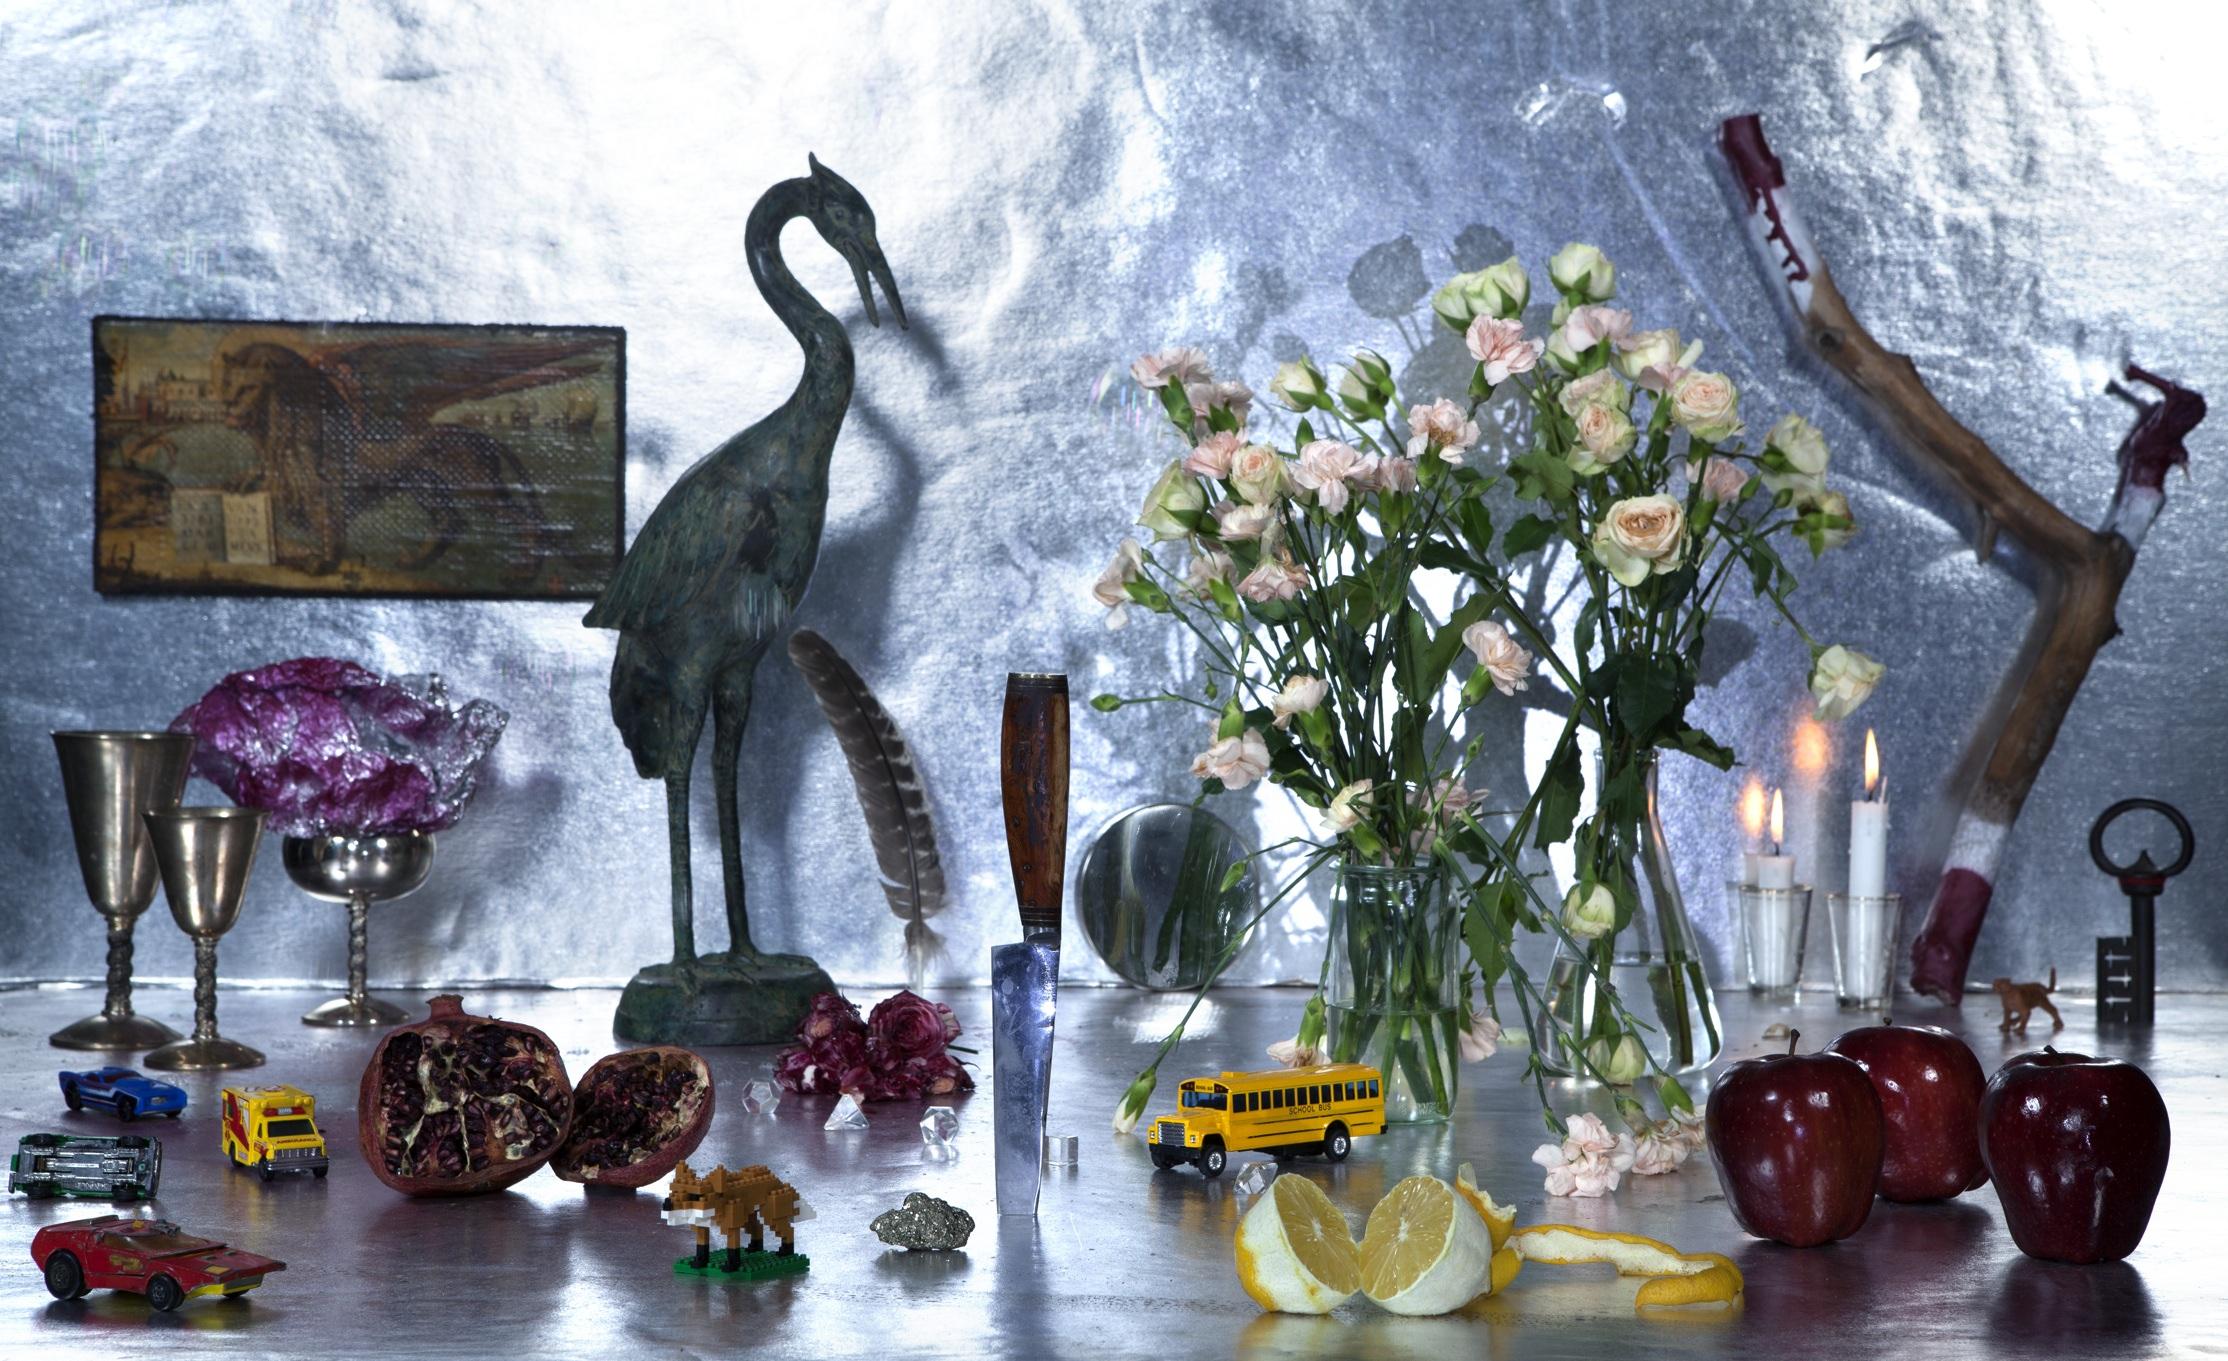 The Exit Fairytale of Suicide - videoart fineart Annina Roescheisen_8